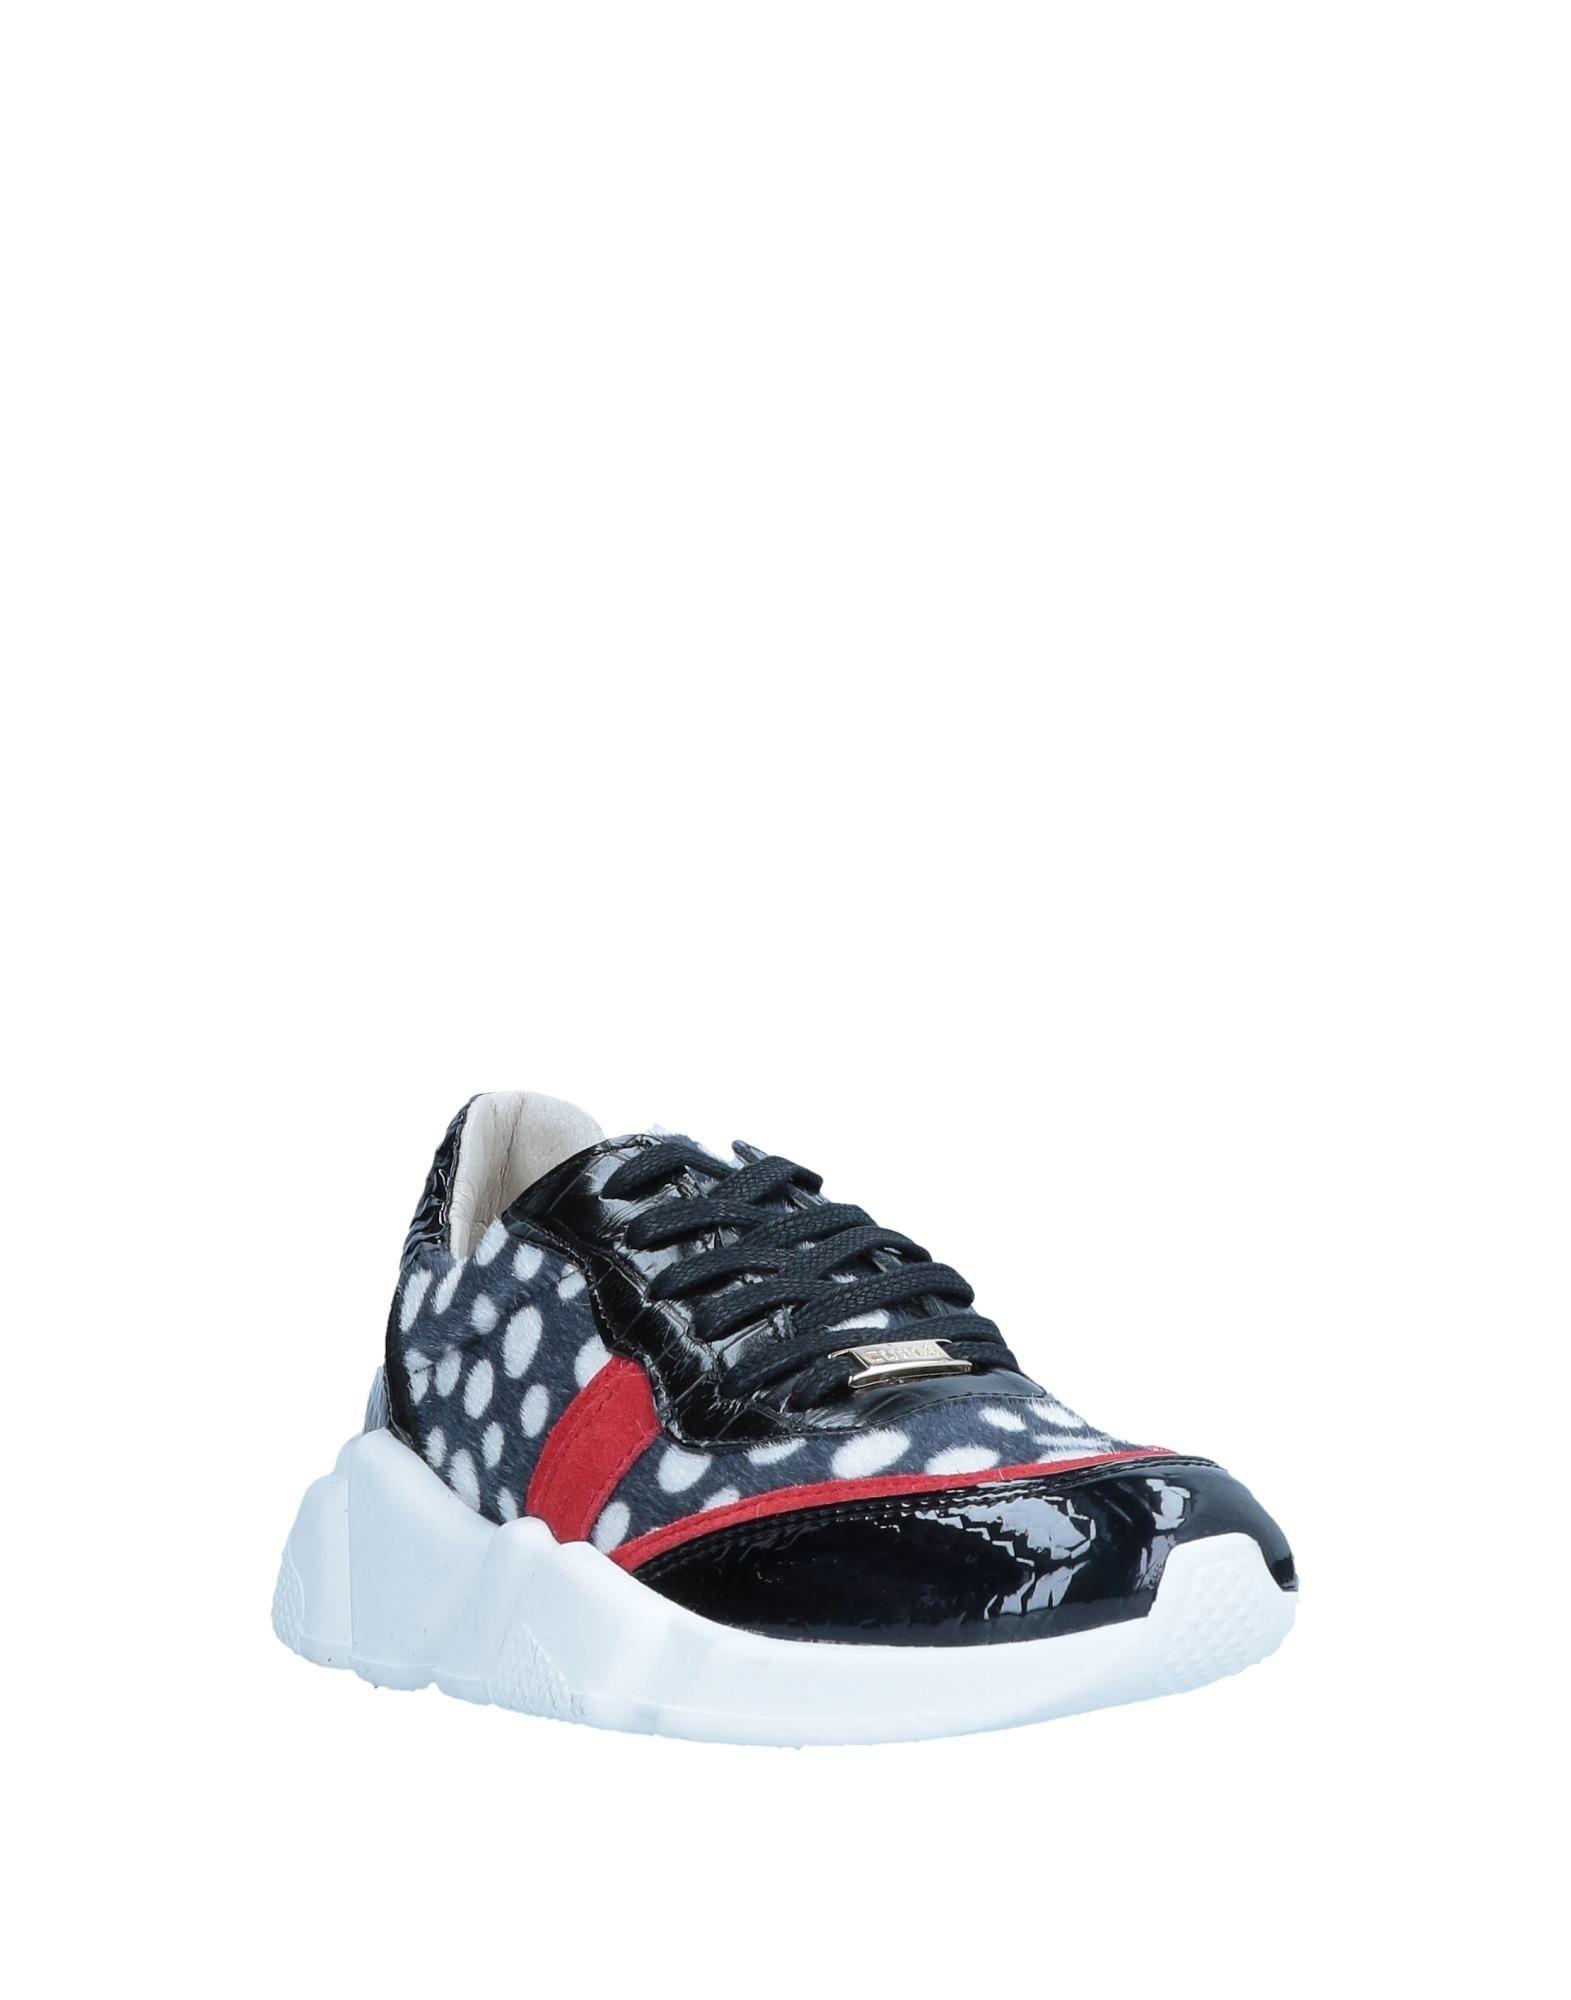 Stilvolle Cuplé billige Schuhe Cuplé Stilvolle Sneakers Damen  11558348VN 5fdb07